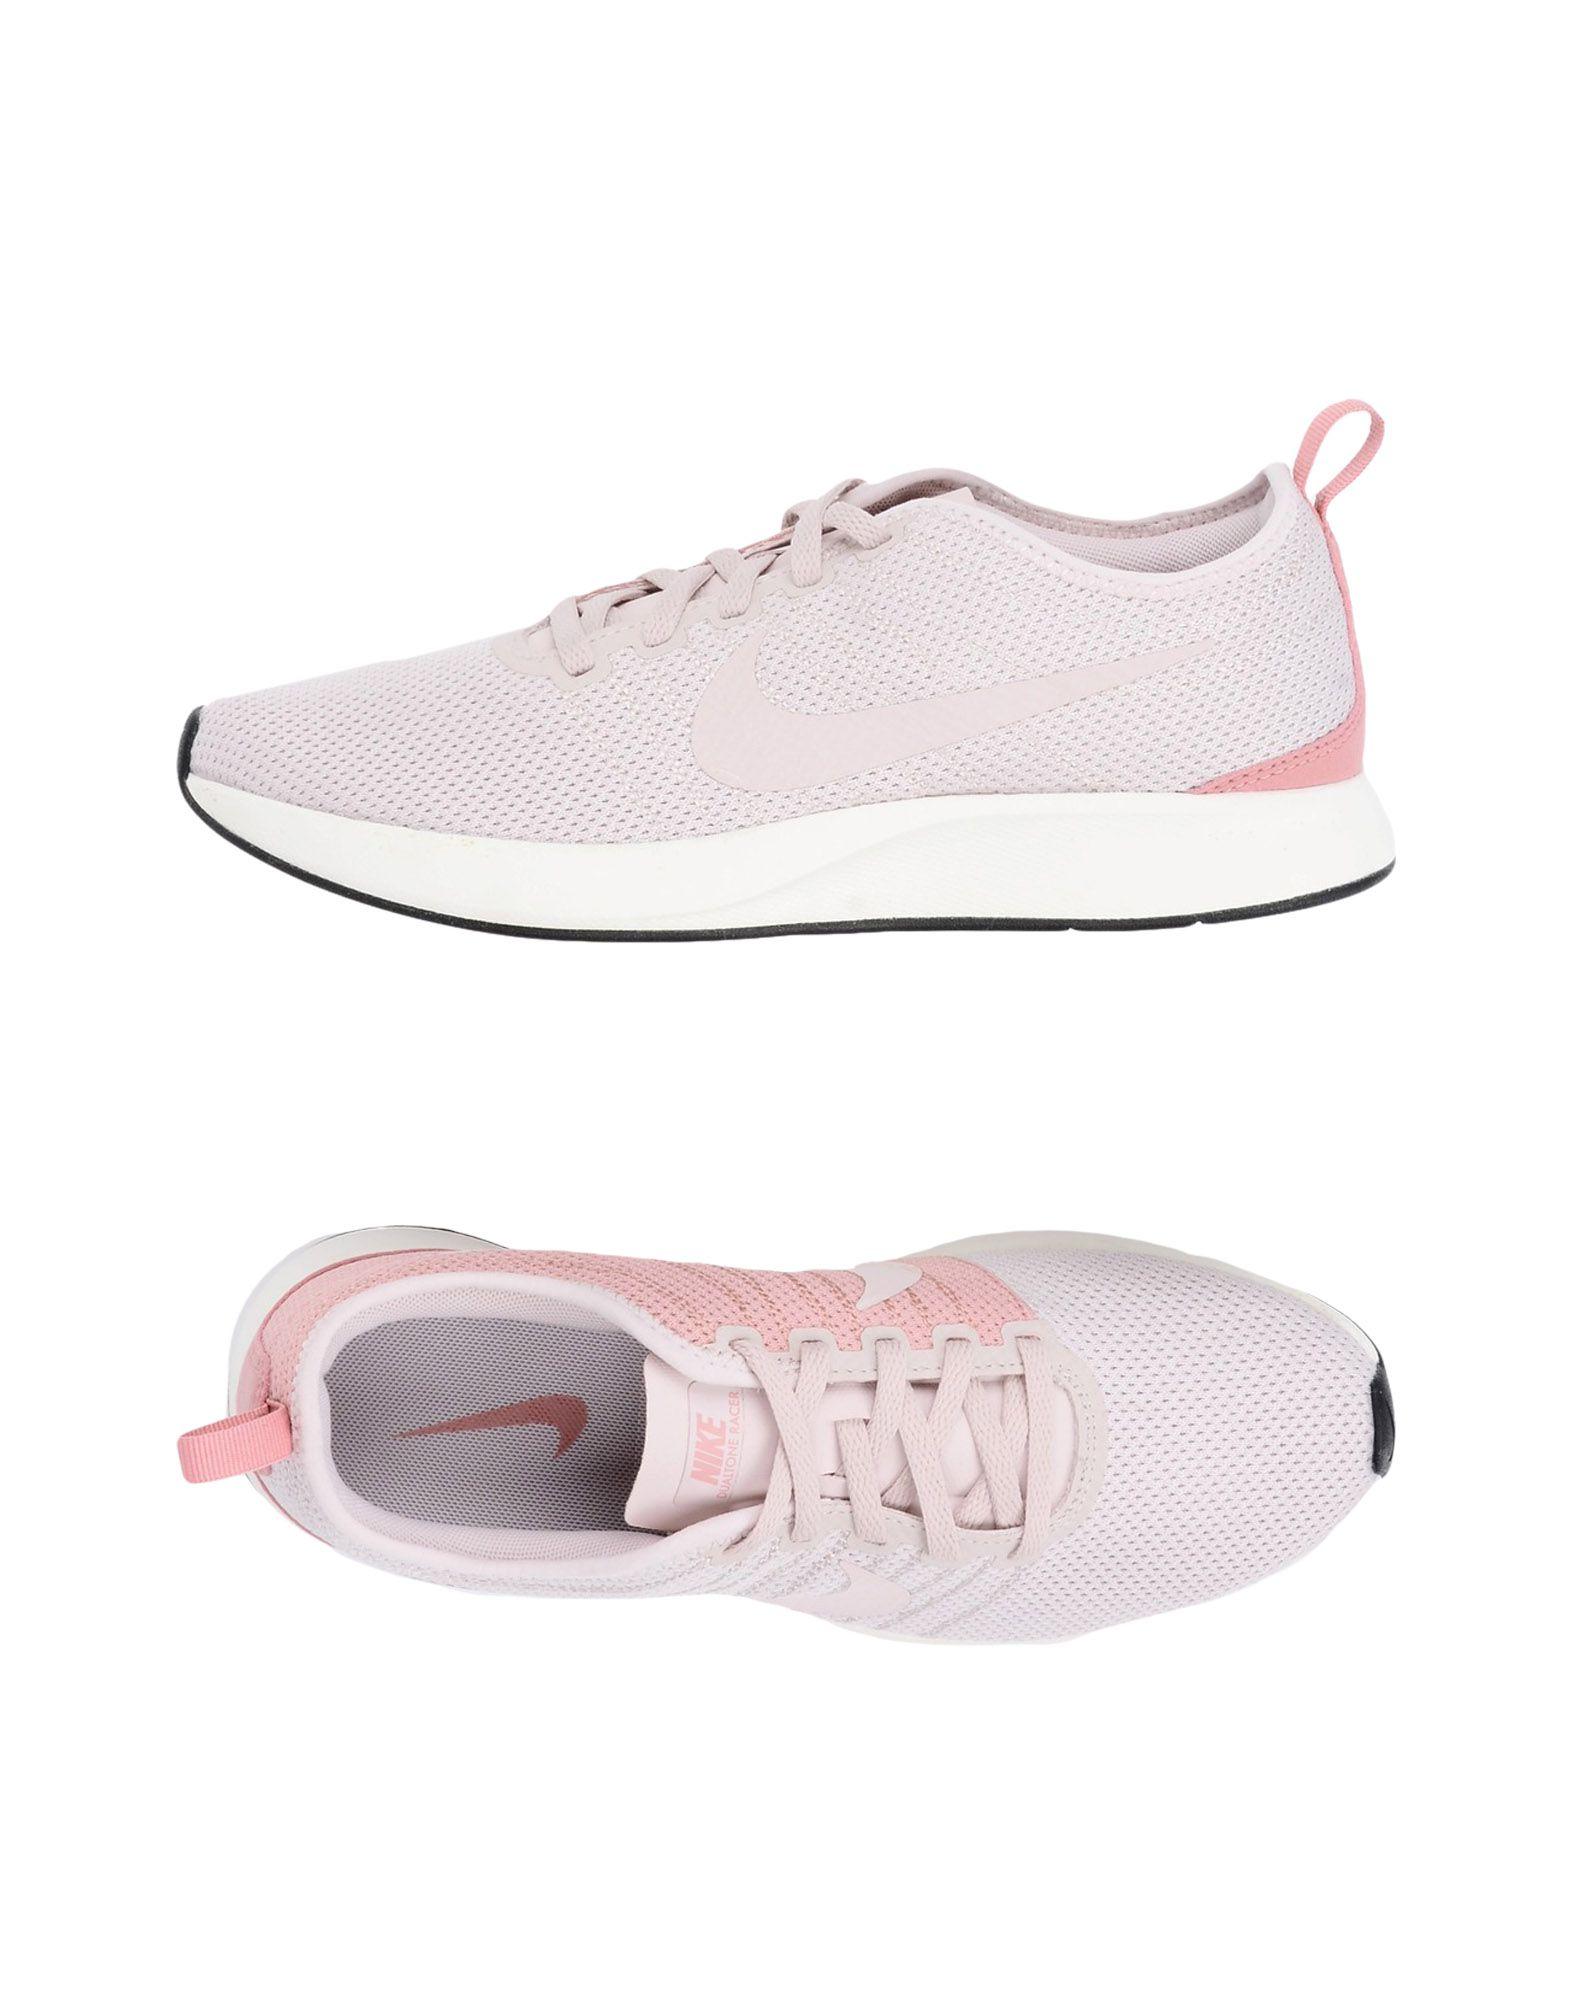 Tiempo limitado especial Zapatillas Nike -    Dualtone Racer - Nike Mujer - Zapatillas Nike  Rosa claro e587e3